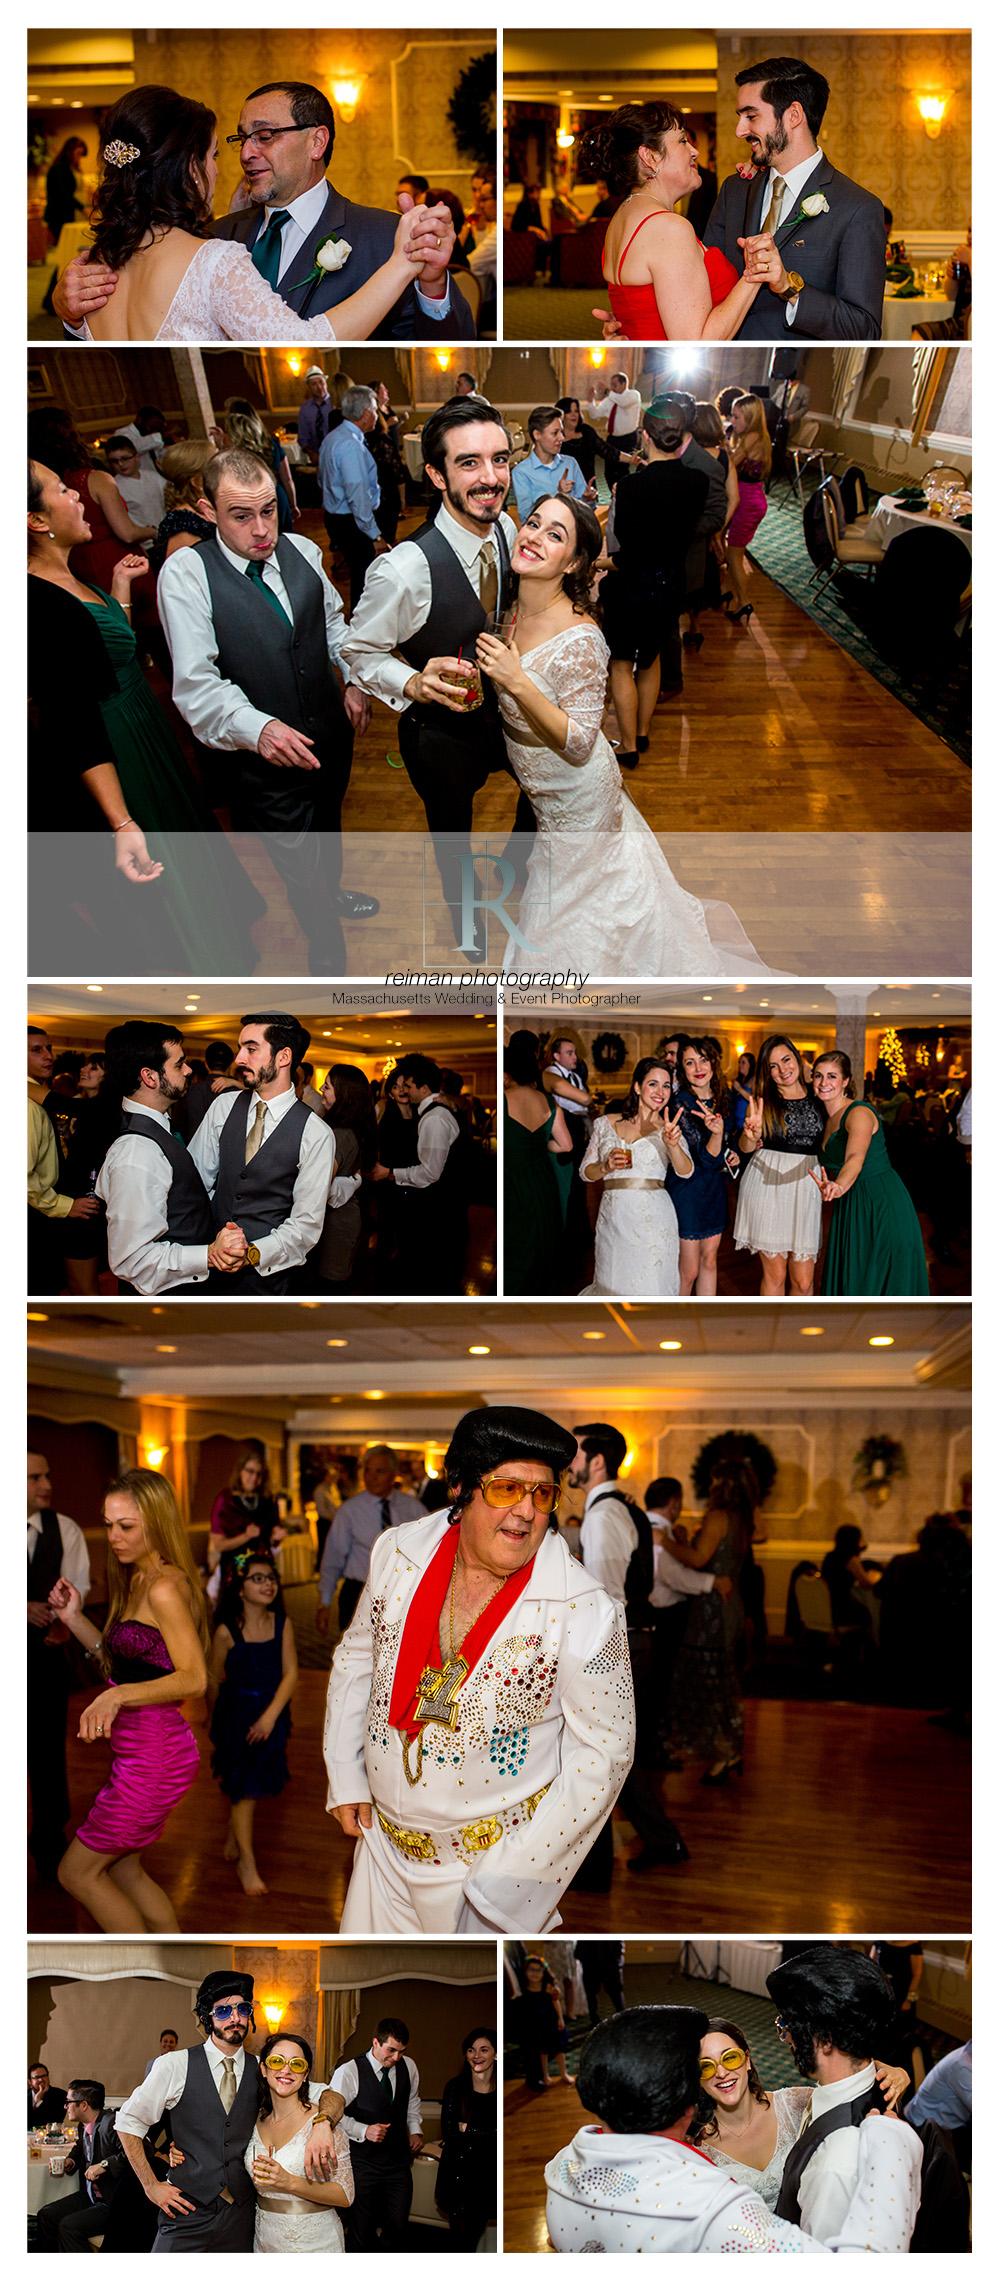 Reiman Photography, wedding, Wachusett Country Club, winter